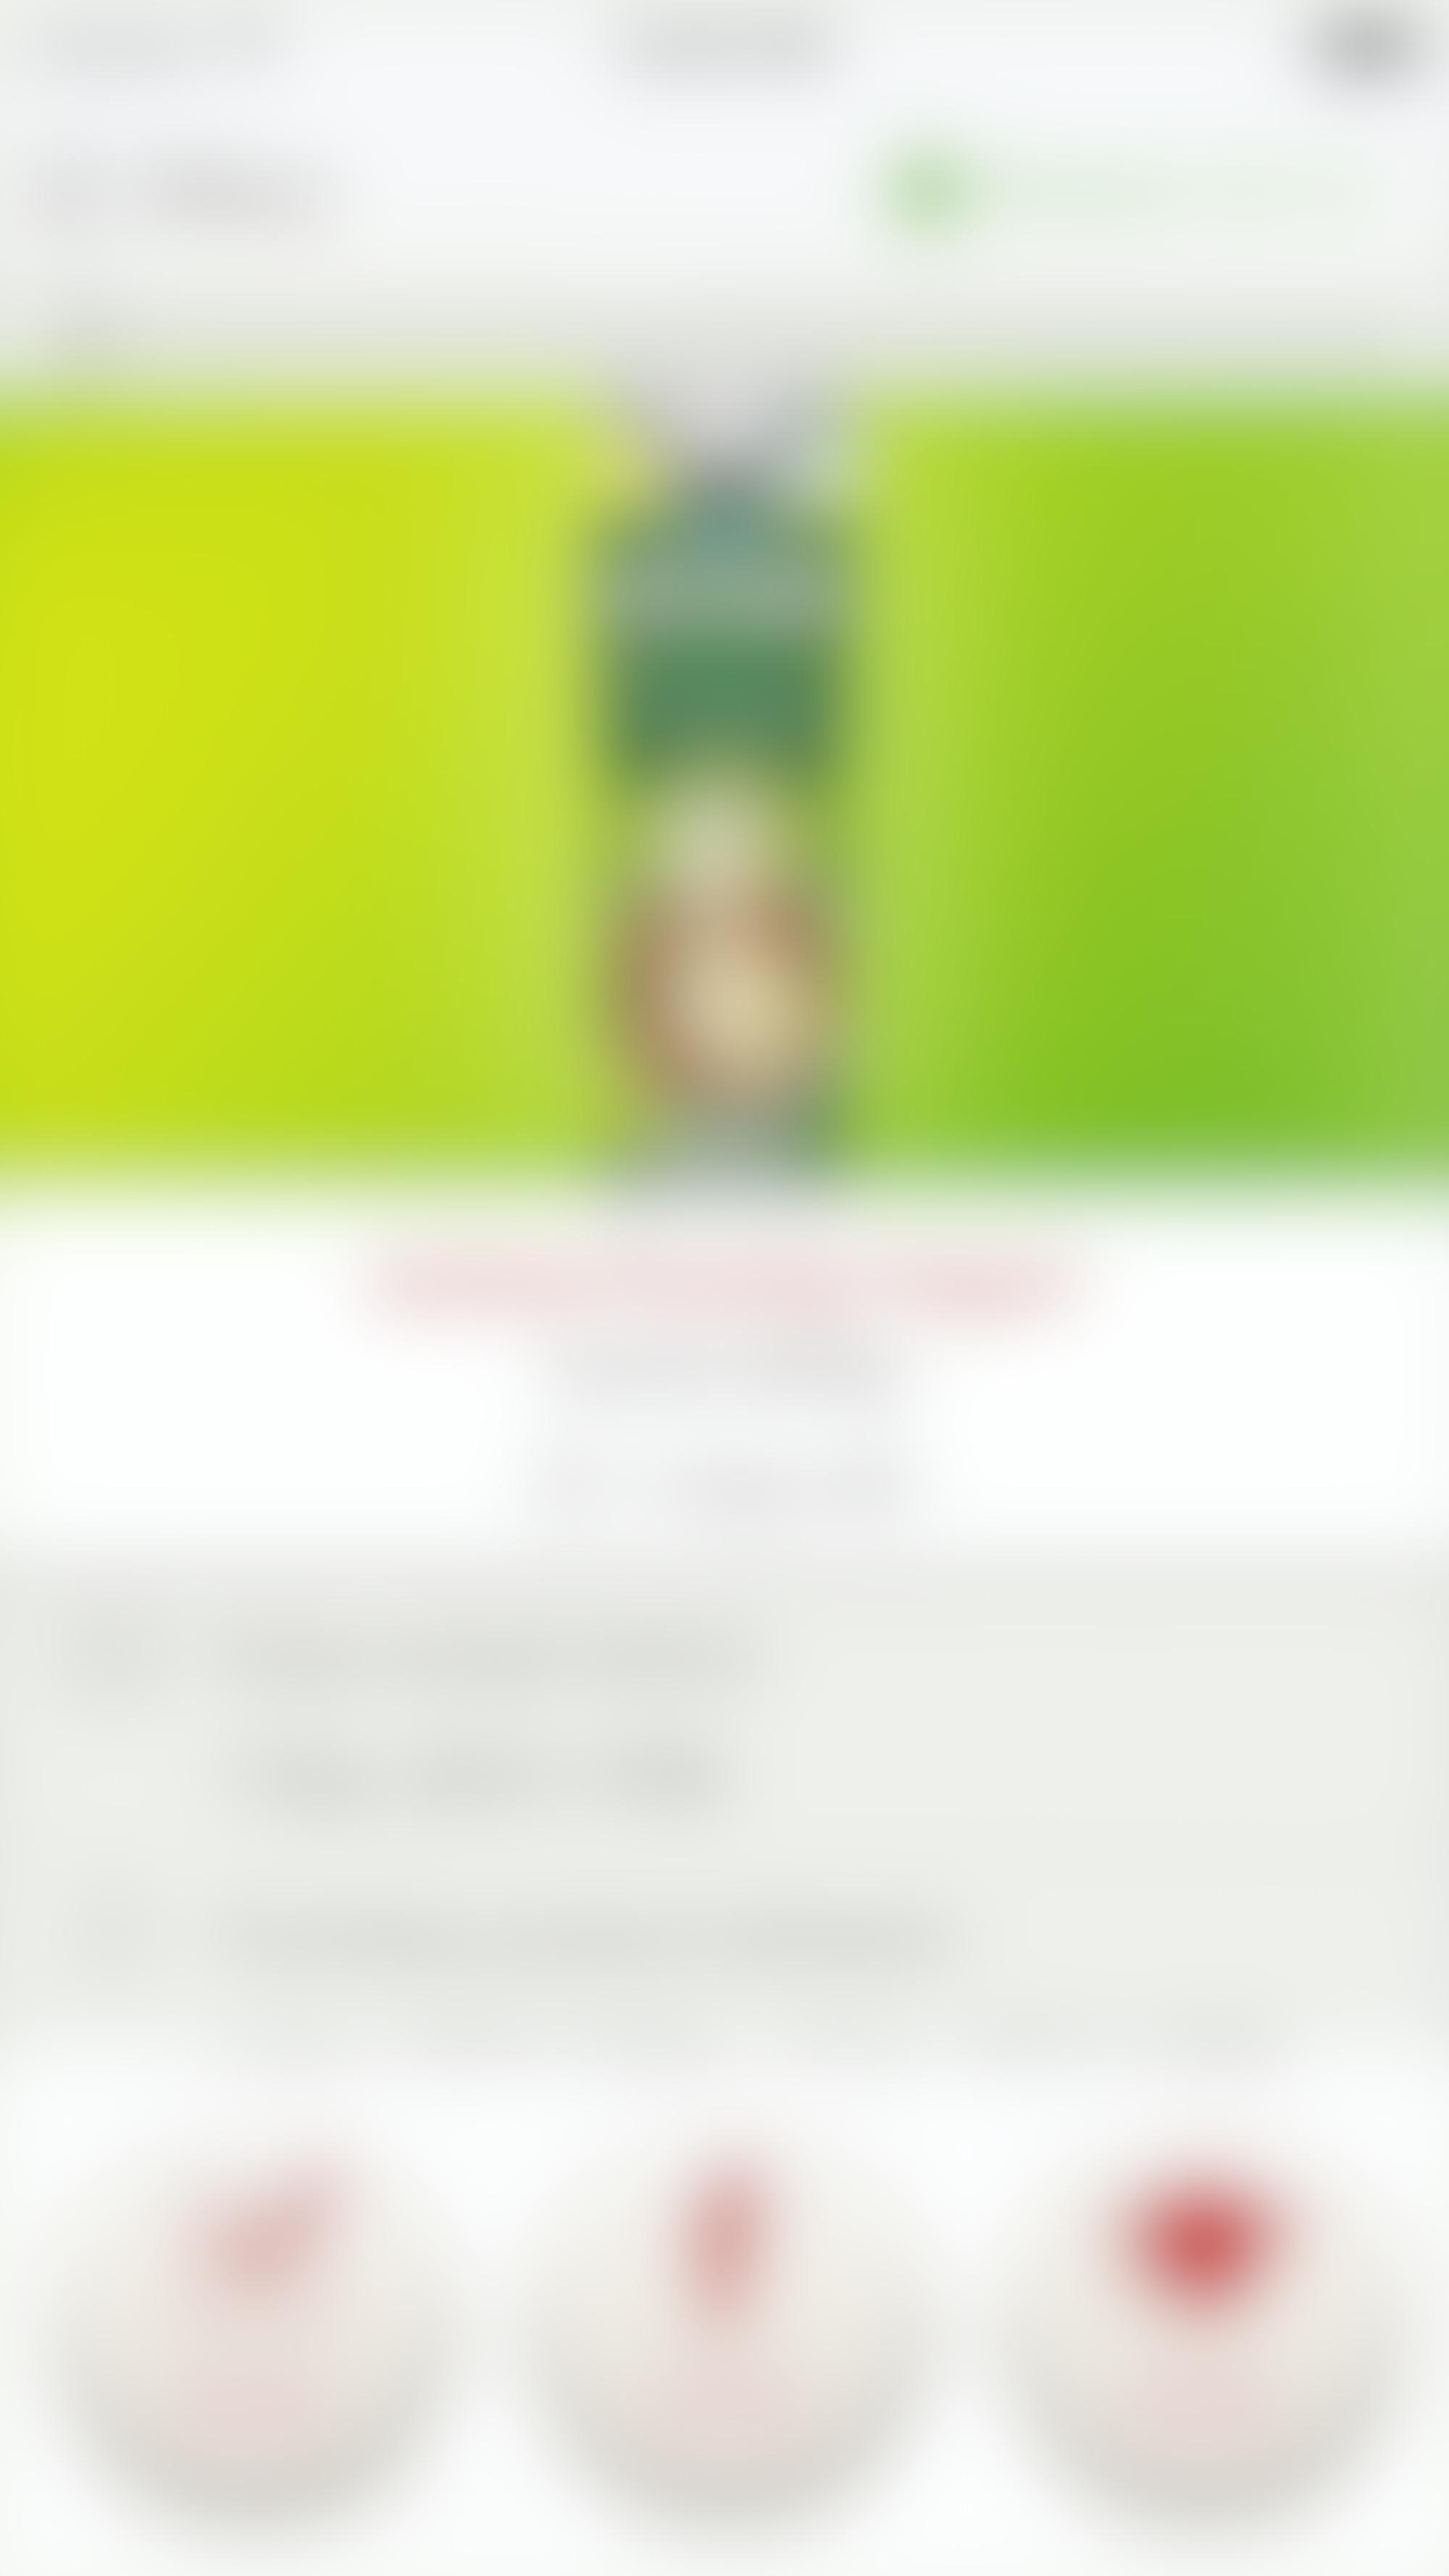 Shopitize mobile app design 2401x autocompressfitresizeixlibphp 1 1 0max h2000max w3 D2000q80s07d224543d55b12669bfdc003edab1ec